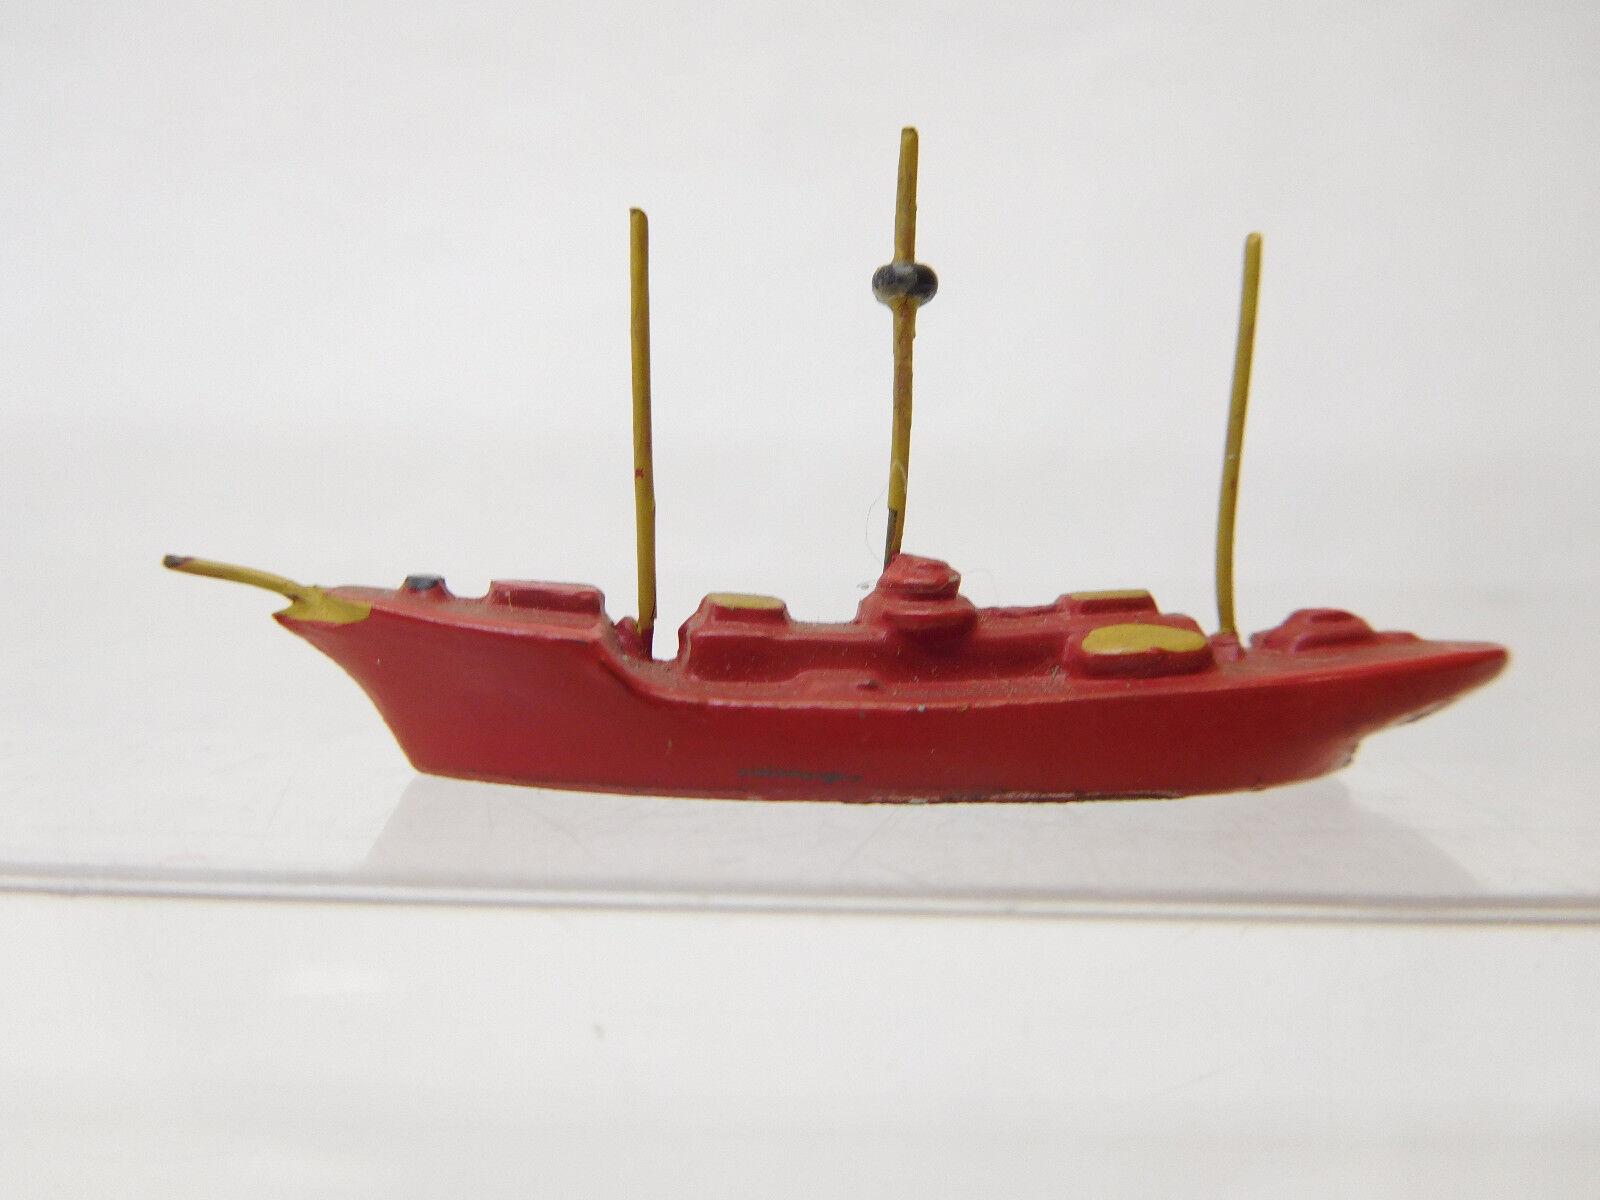 Mes-53183 Wiking 1 1250 feu bateau très bon état